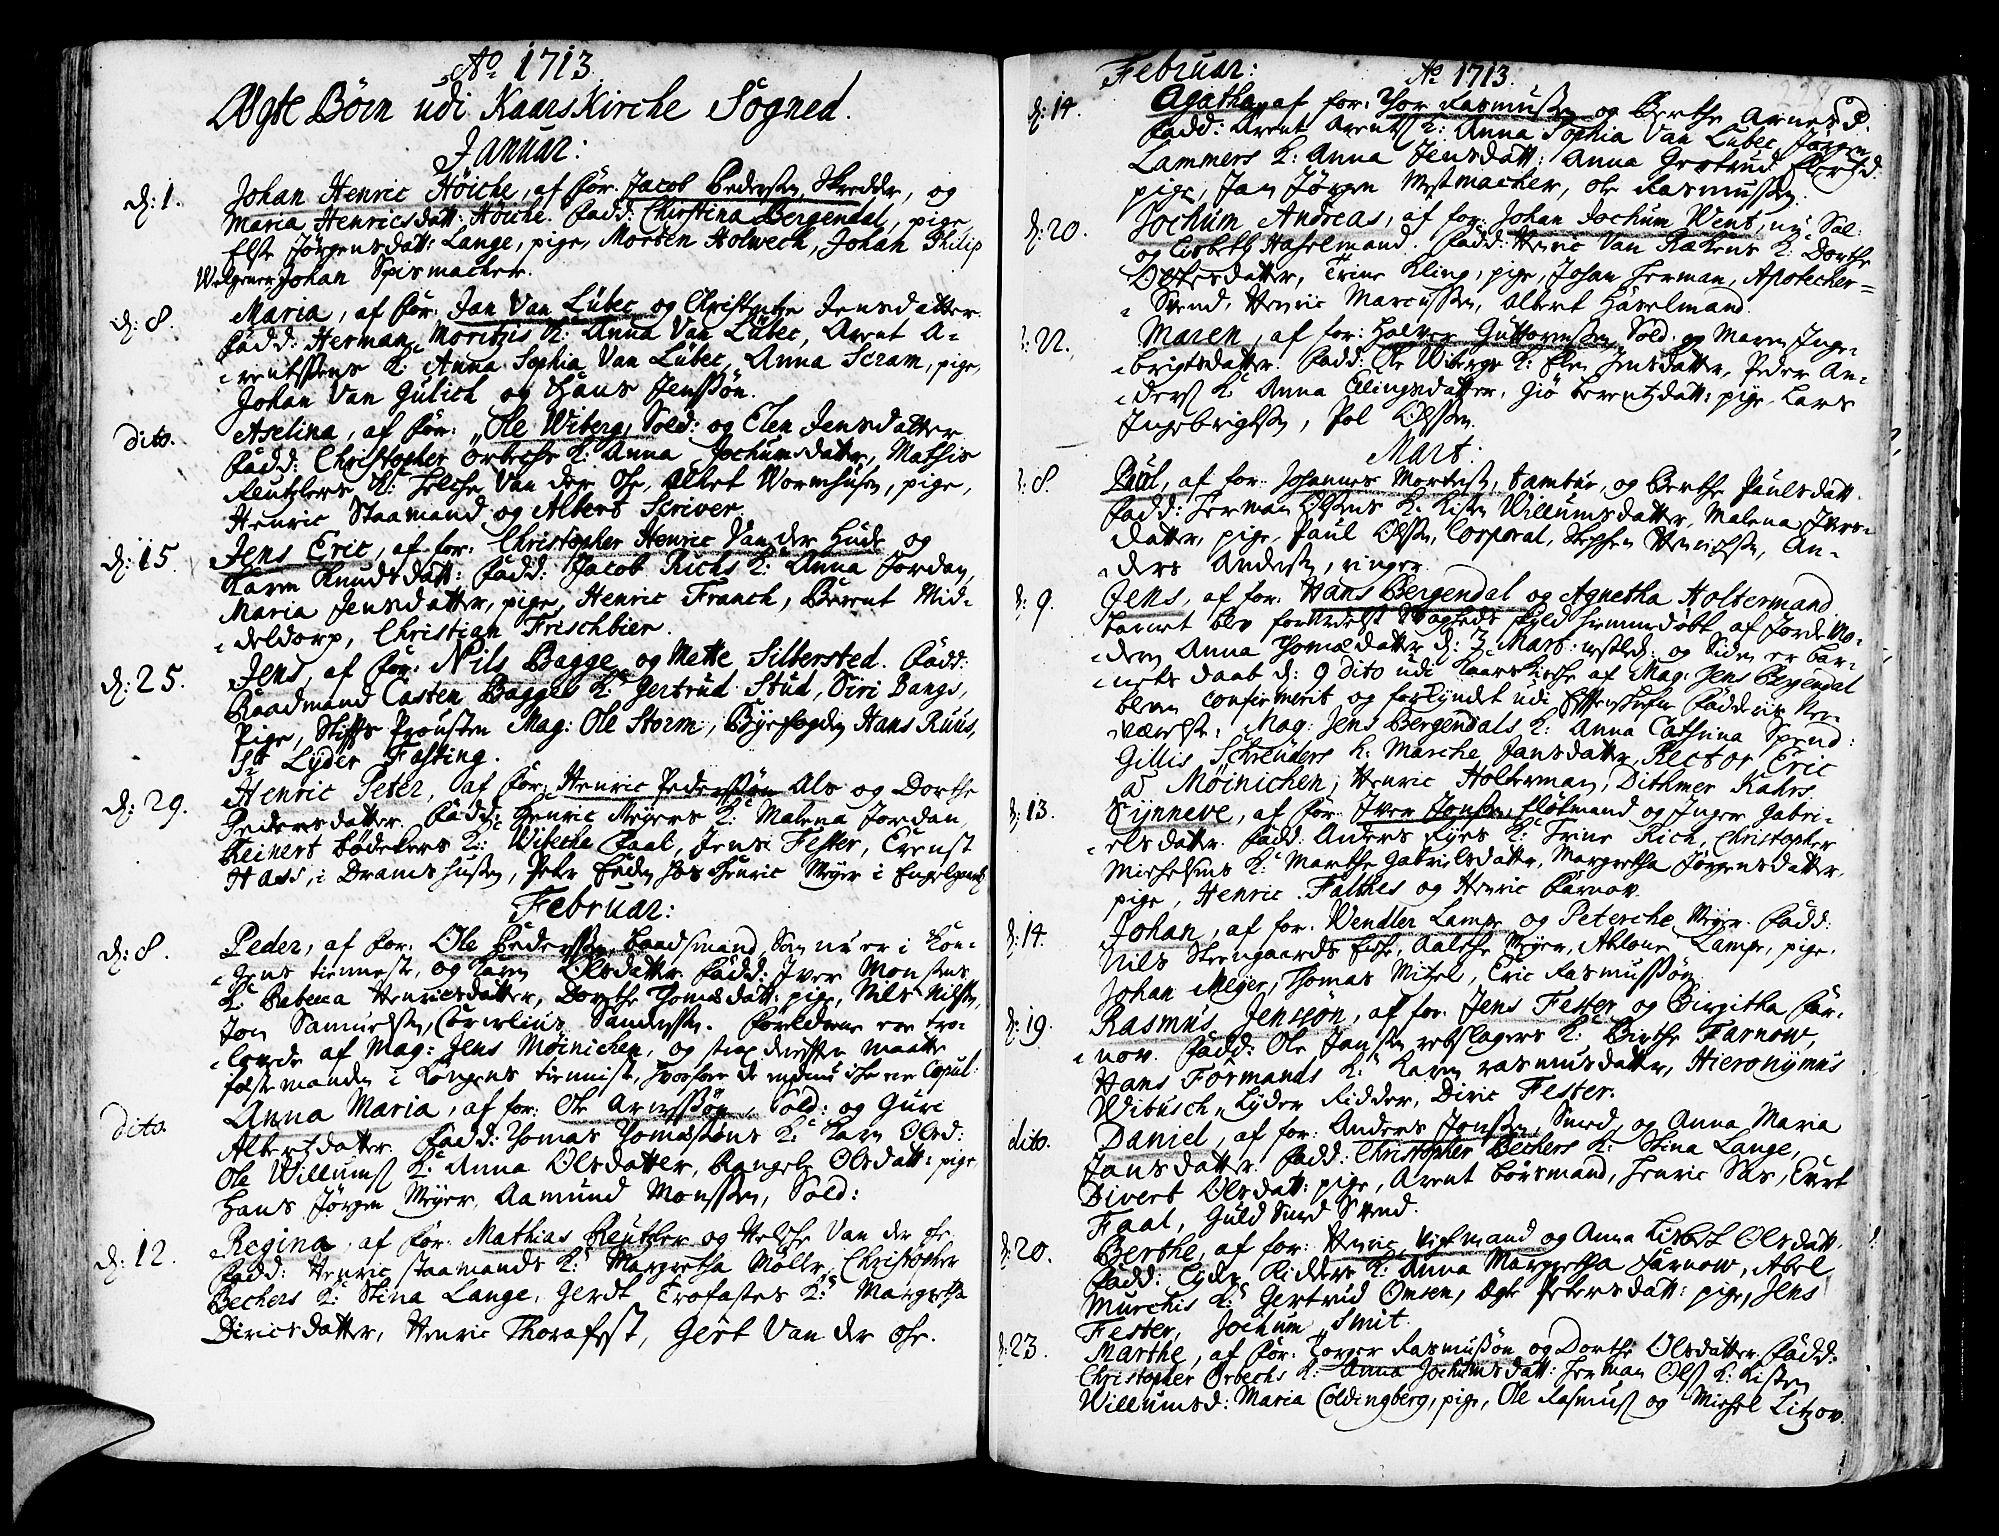 SAB, Korskirken Sokneprestembete, H/Haa/L0003: Ministerialbok nr. A 3, 1698-1719, s. 228